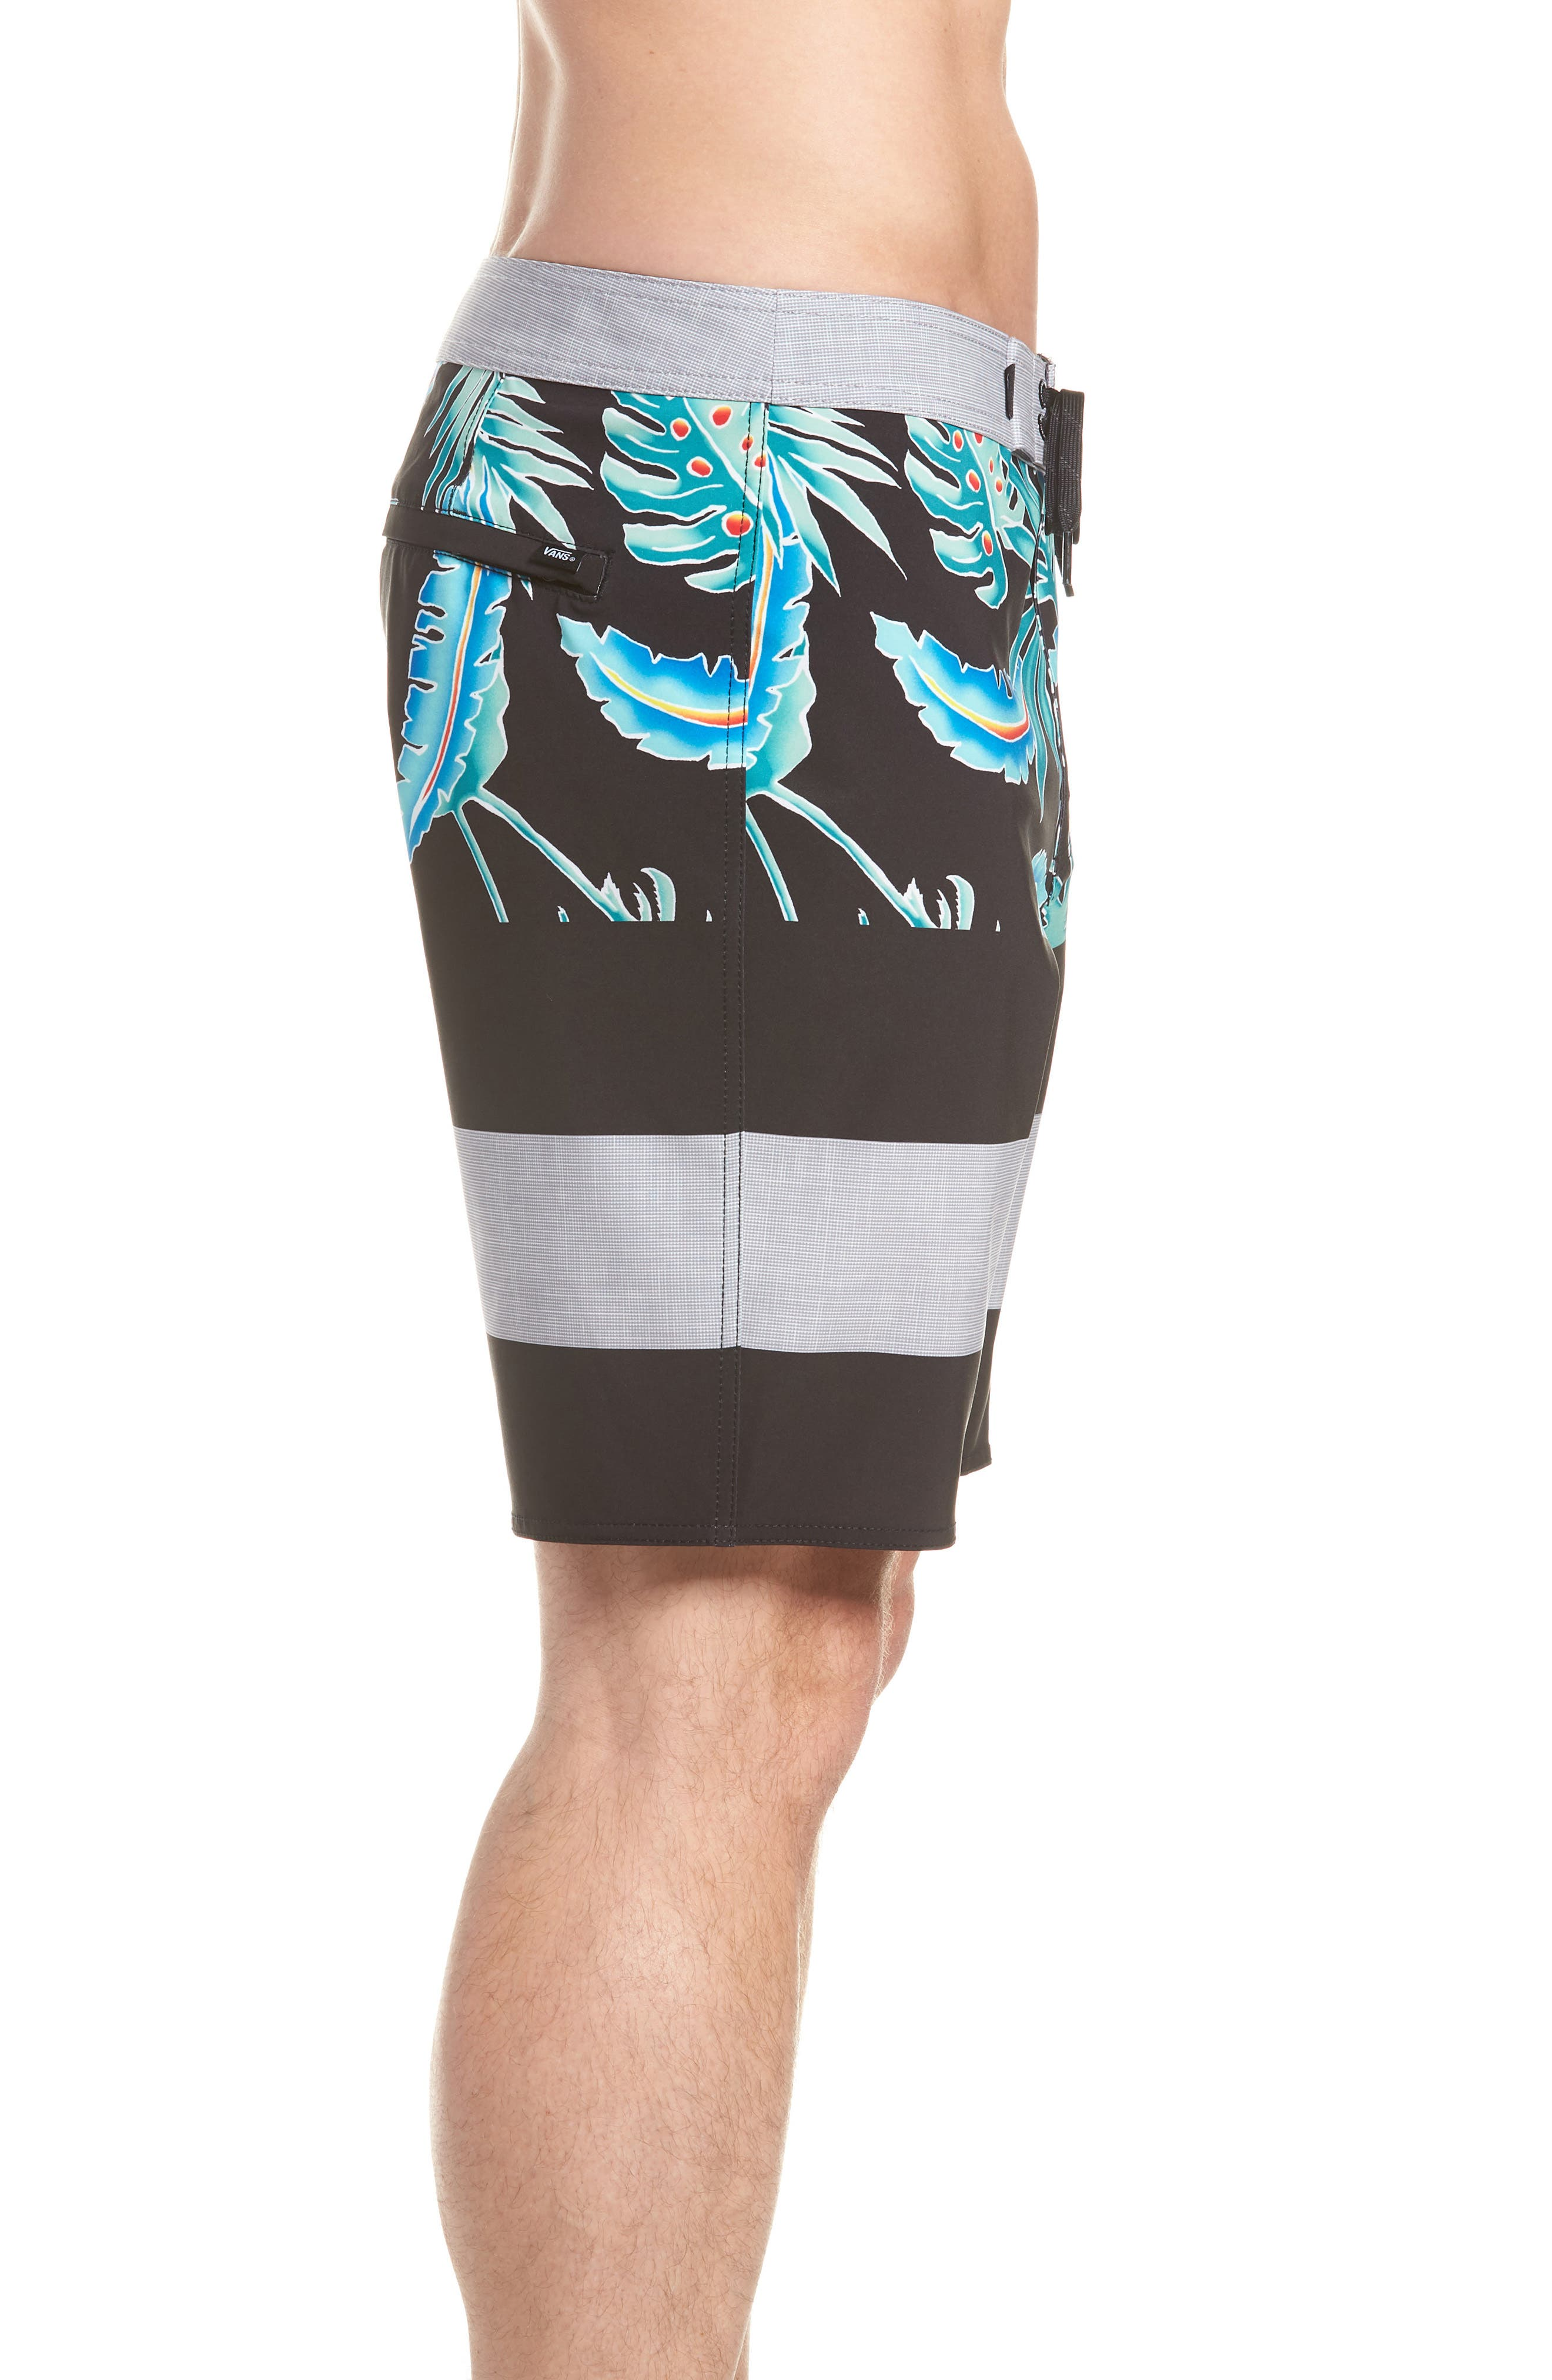 Era Board Shorts,                             Alternate thumbnail 3, color,                             Black Pit Stop Floral